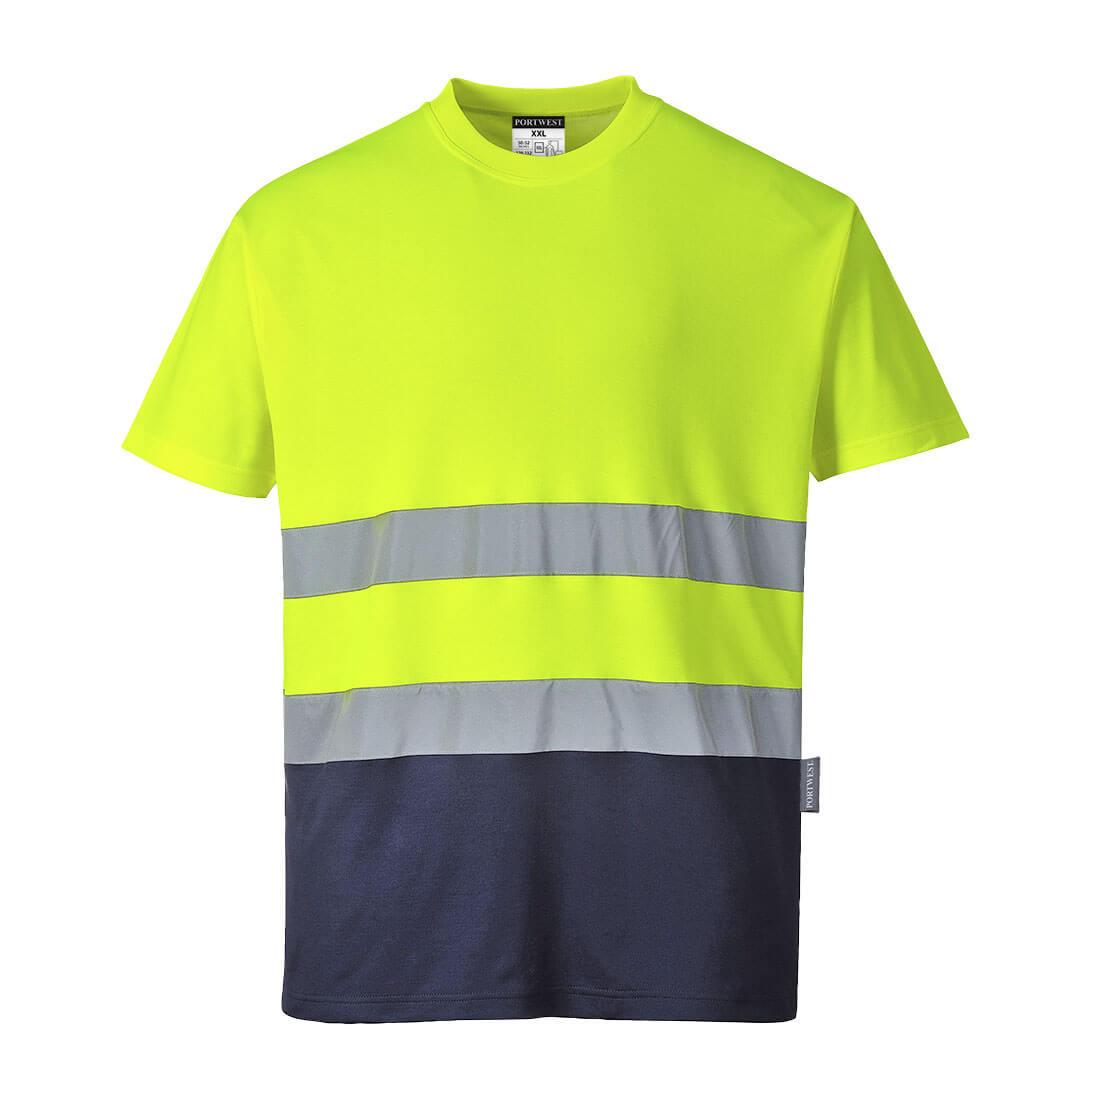 2-Tone Cotton Comfort T-Shirt Yellow/Navy LR